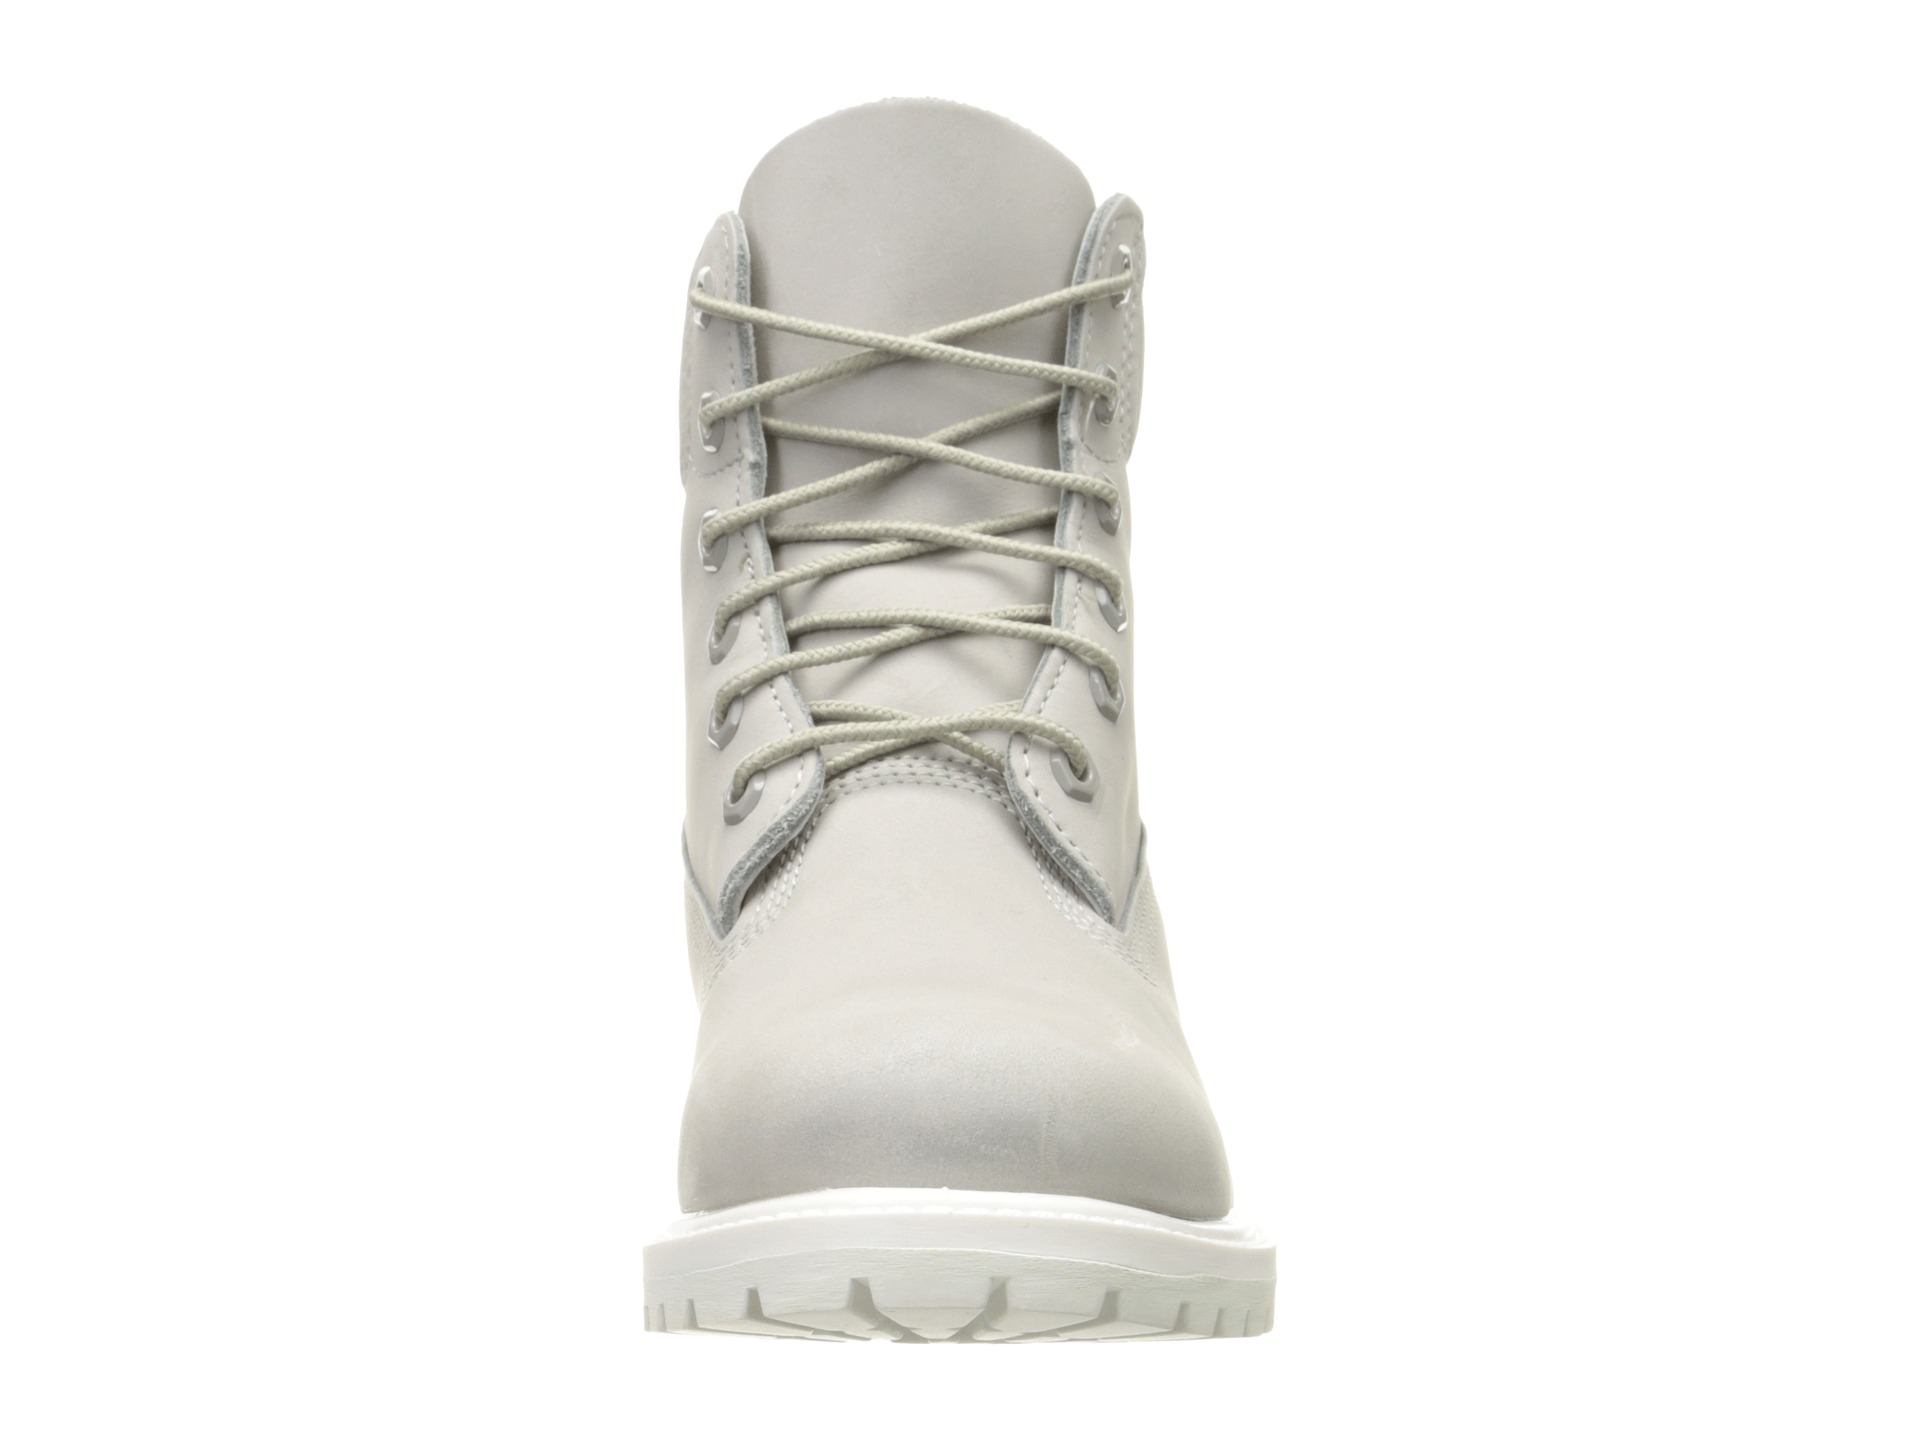 f80ebe91c529 timberland 6 inch premium boot light grey